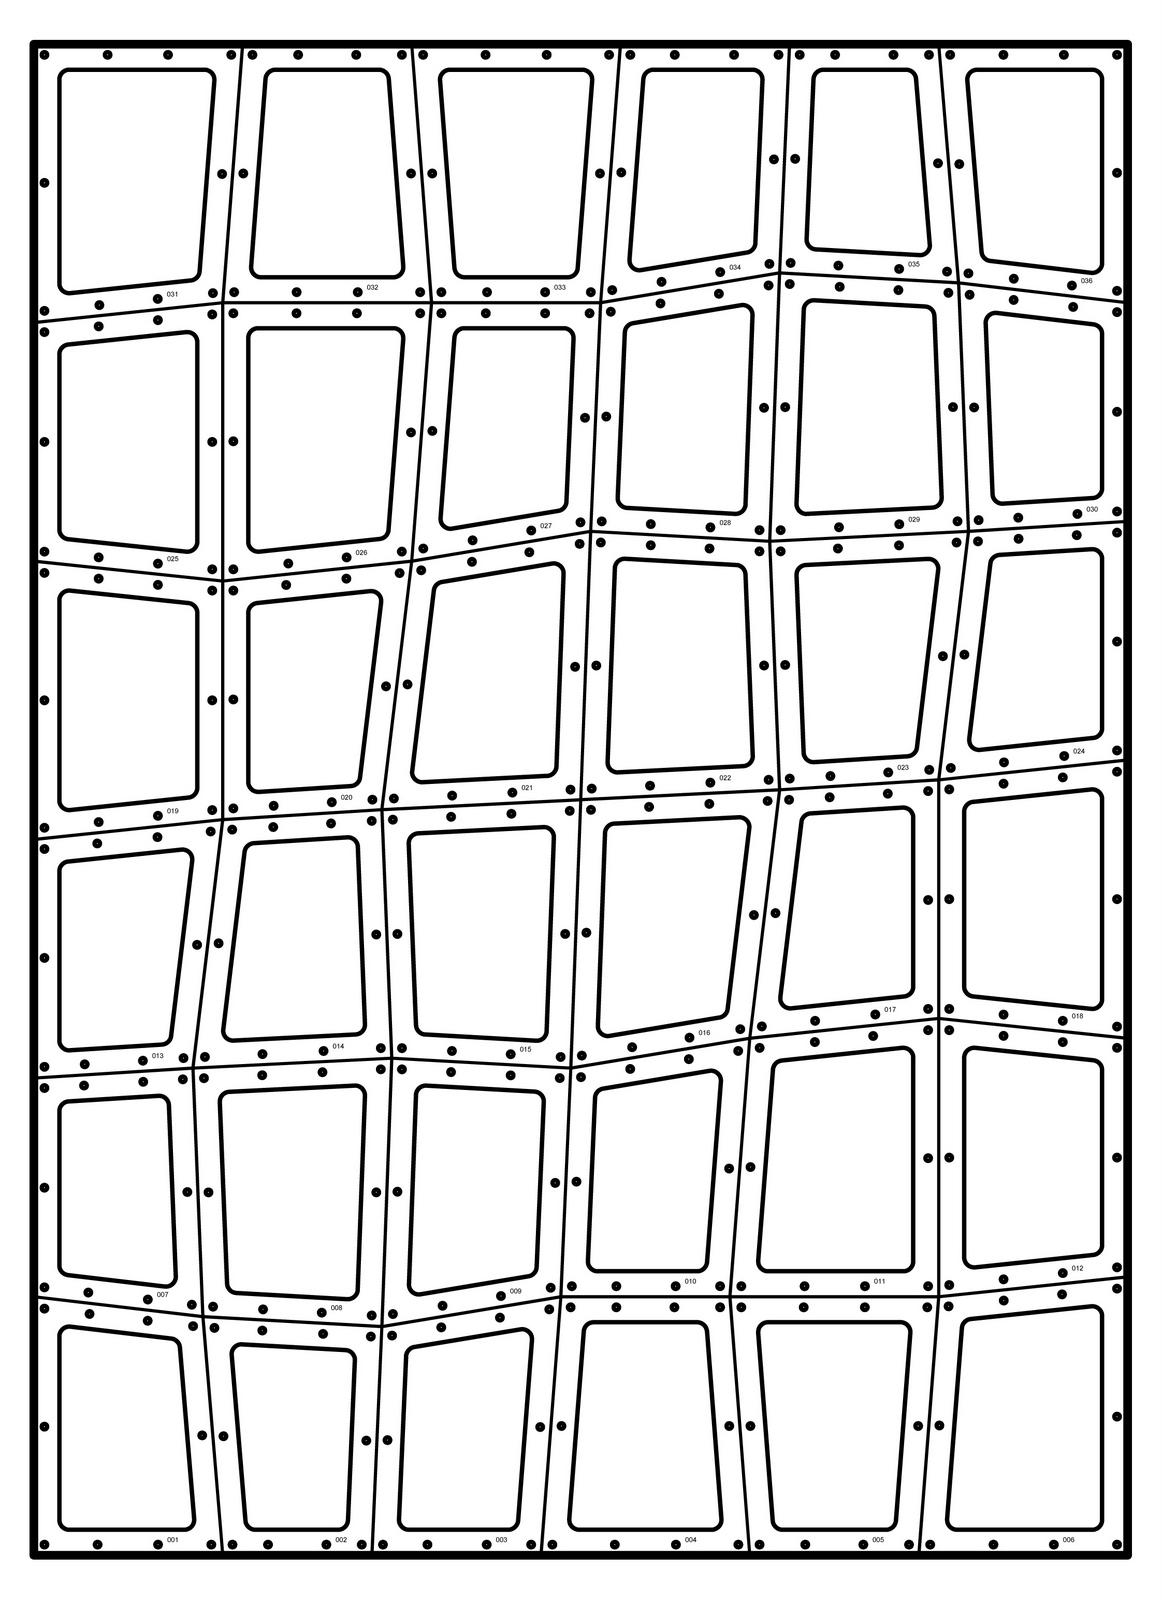 Reflective Tiled Sculpture Fabrication   Caliper Studio - Printable Numbrix Puzzles 2009